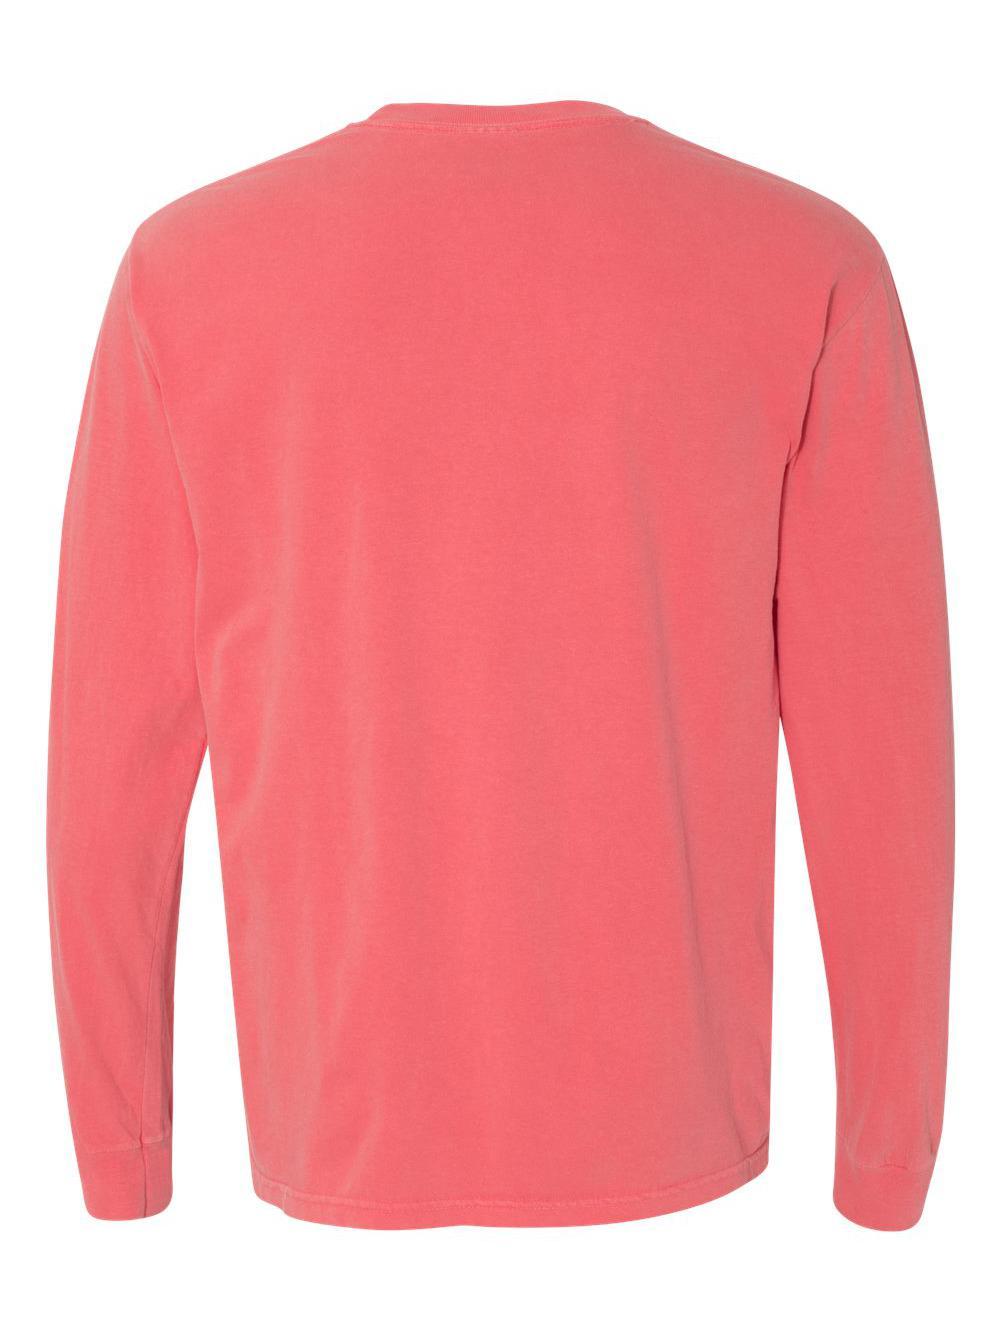 Comfort-Colors-Garment-Dyed-Heavyweight-Ringspun-Long-Sleeve-T-Shirt-6014 thumbnail 70